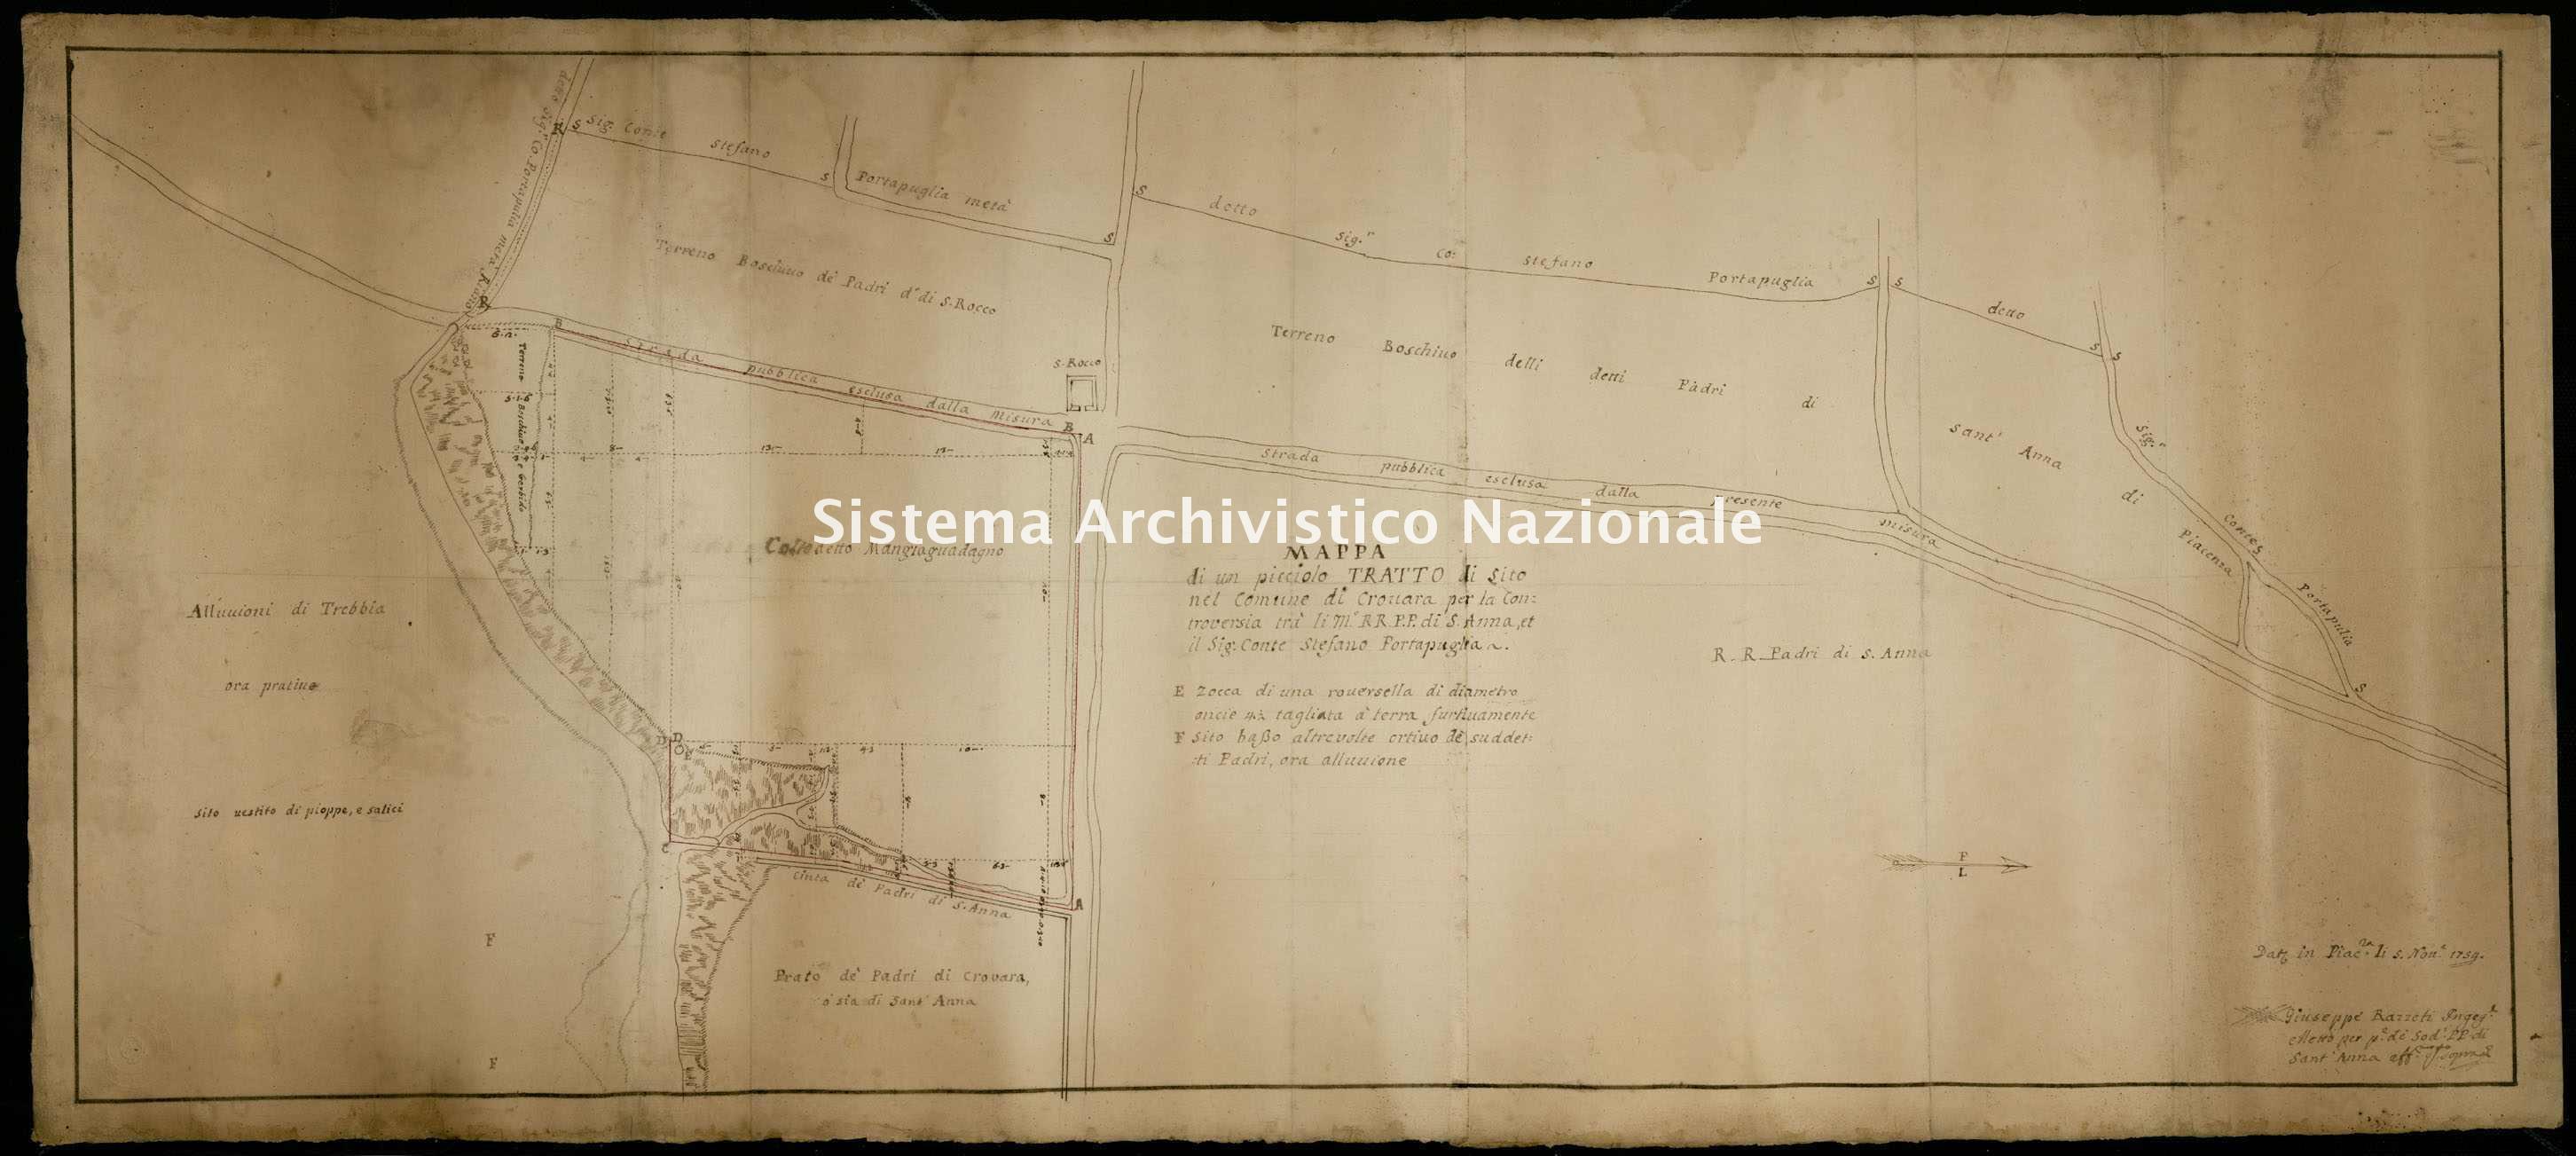 ASPC Mappe, stampe e disegni, n. 5124